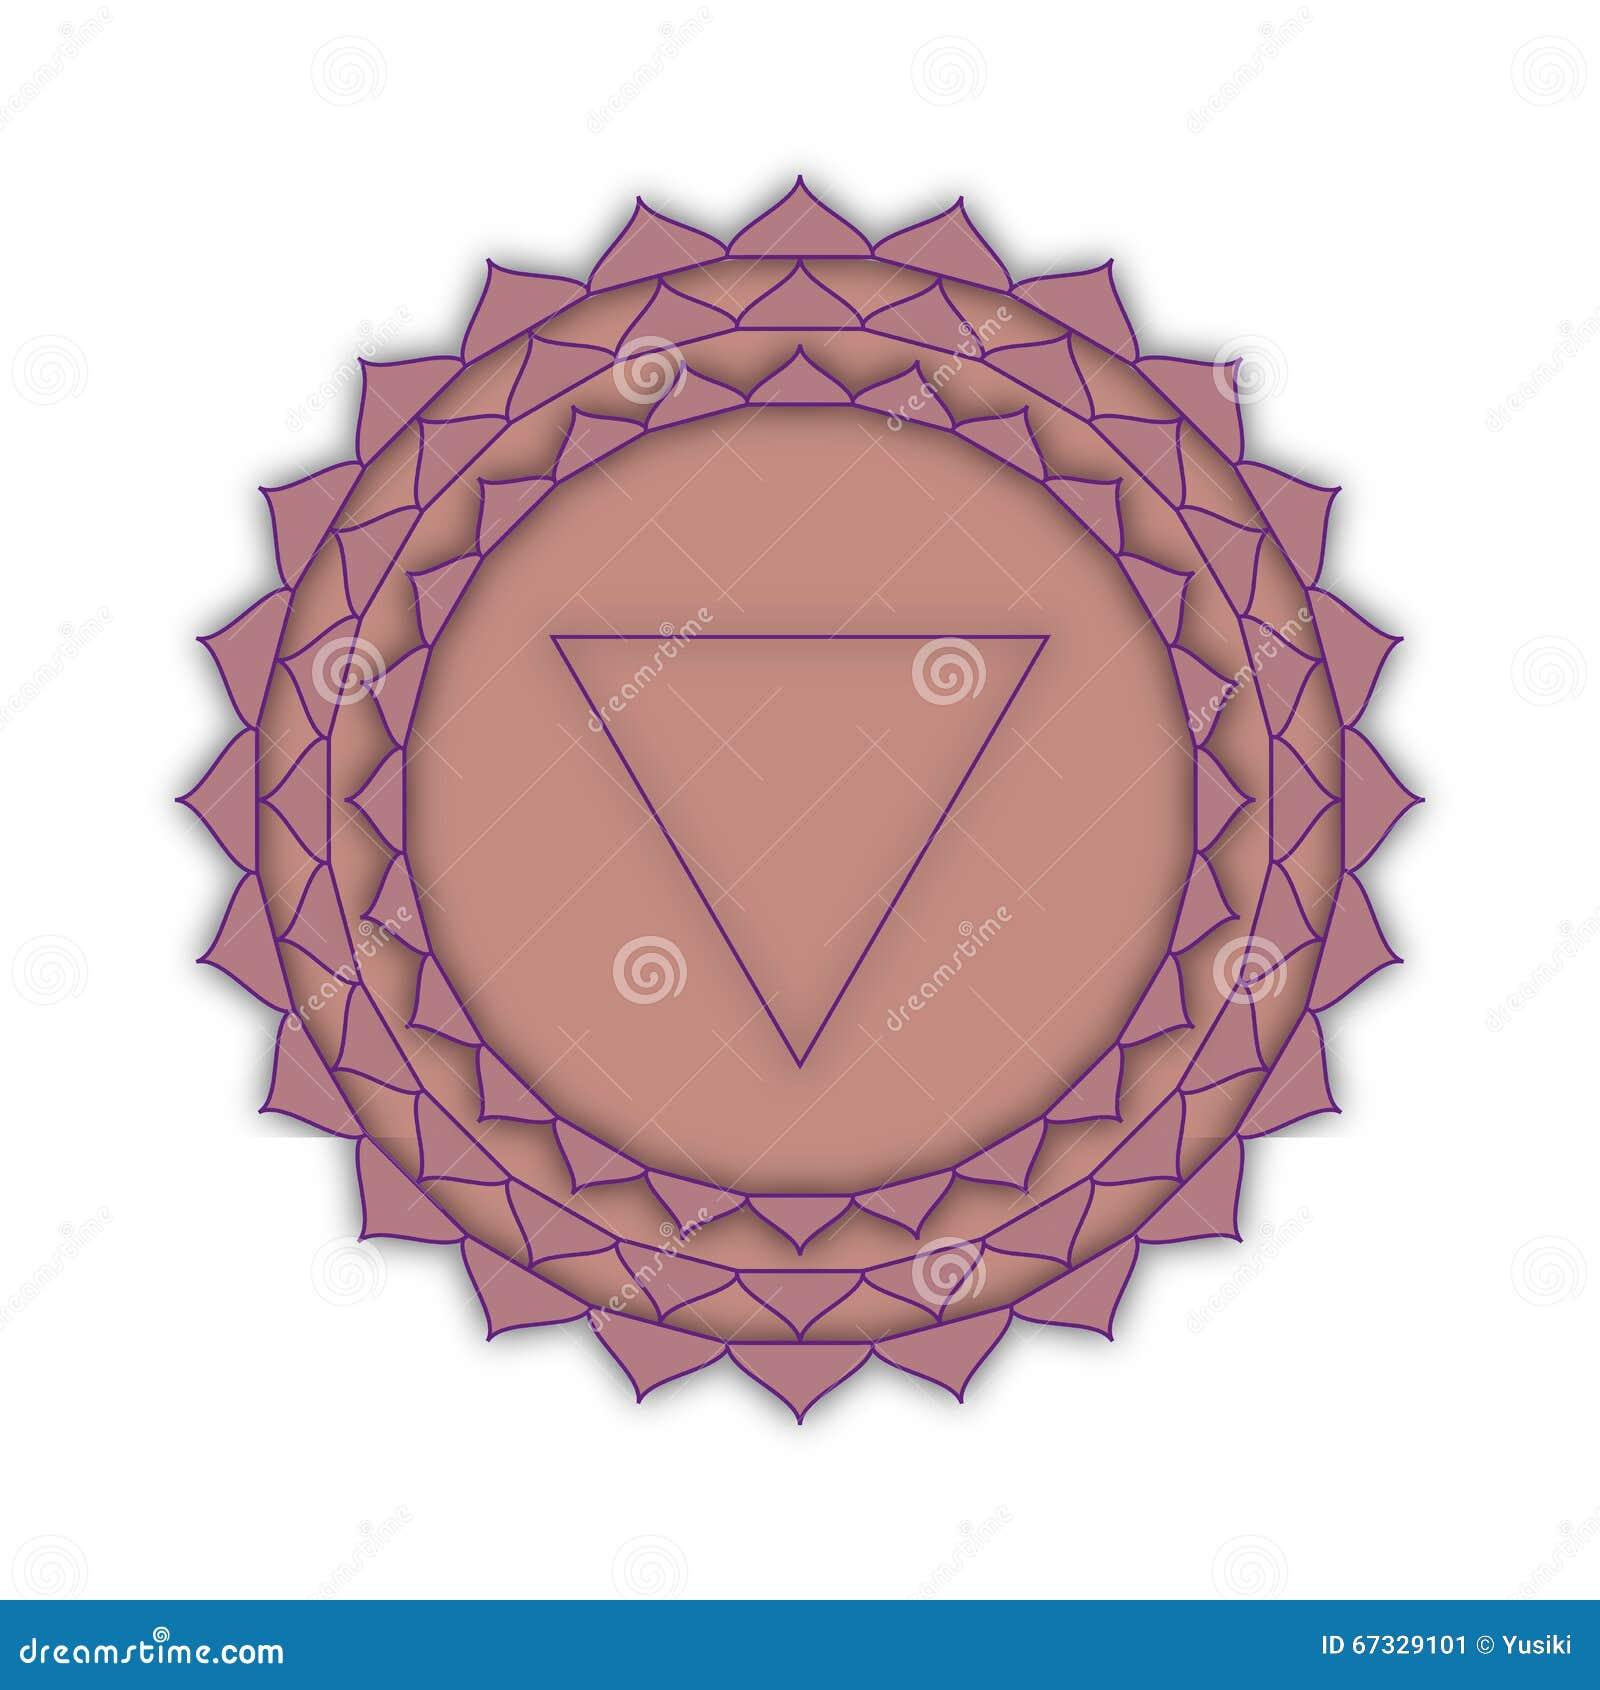 Sahasrara the crown chakra the symbol of the seventh chakra sahasrara the crown chakra the symbol of the seventh chakra buycottarizona Image collections